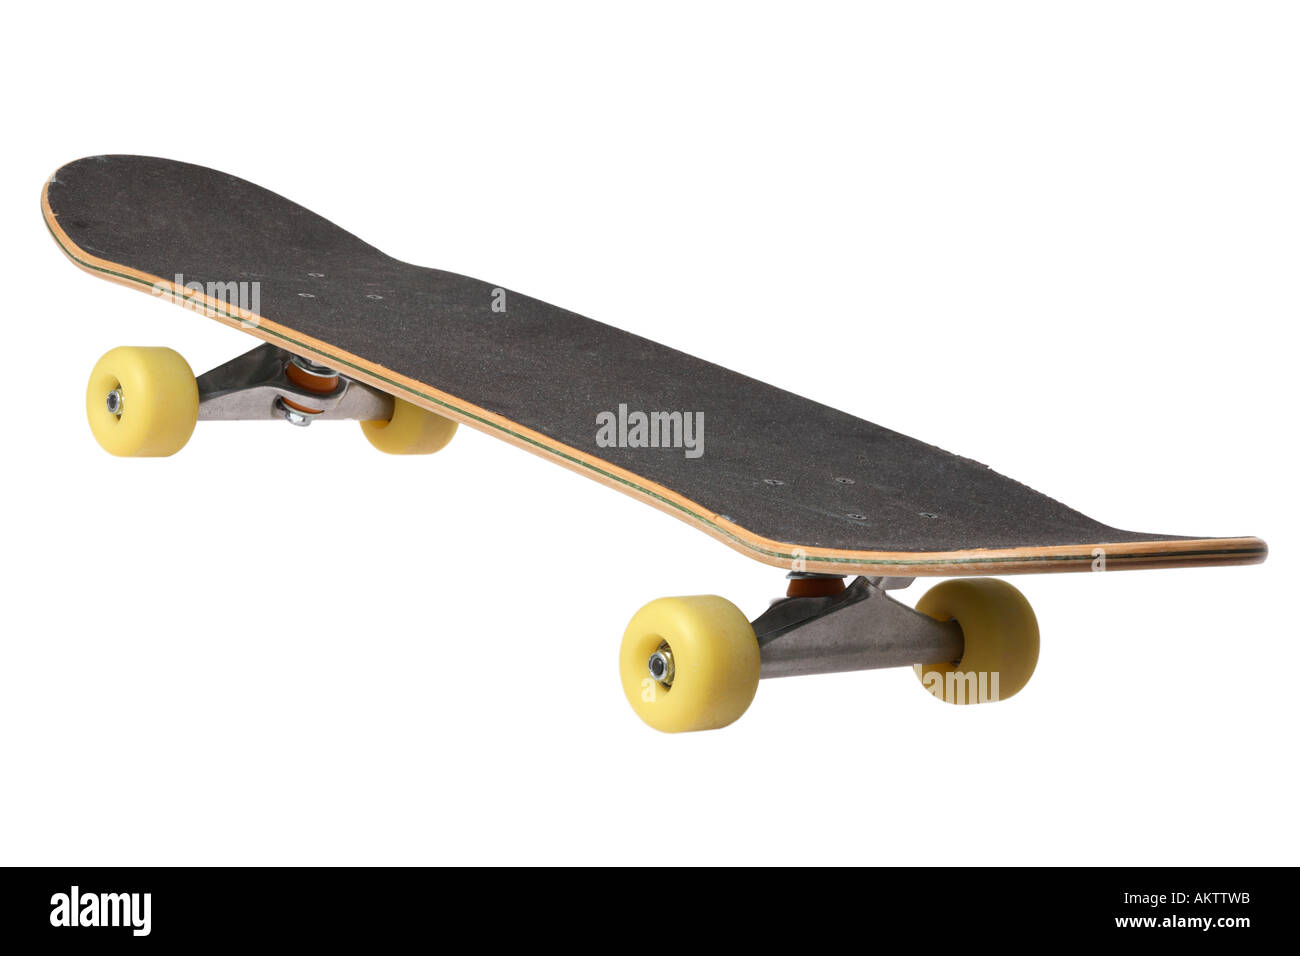 Skateboard Immagini Stock